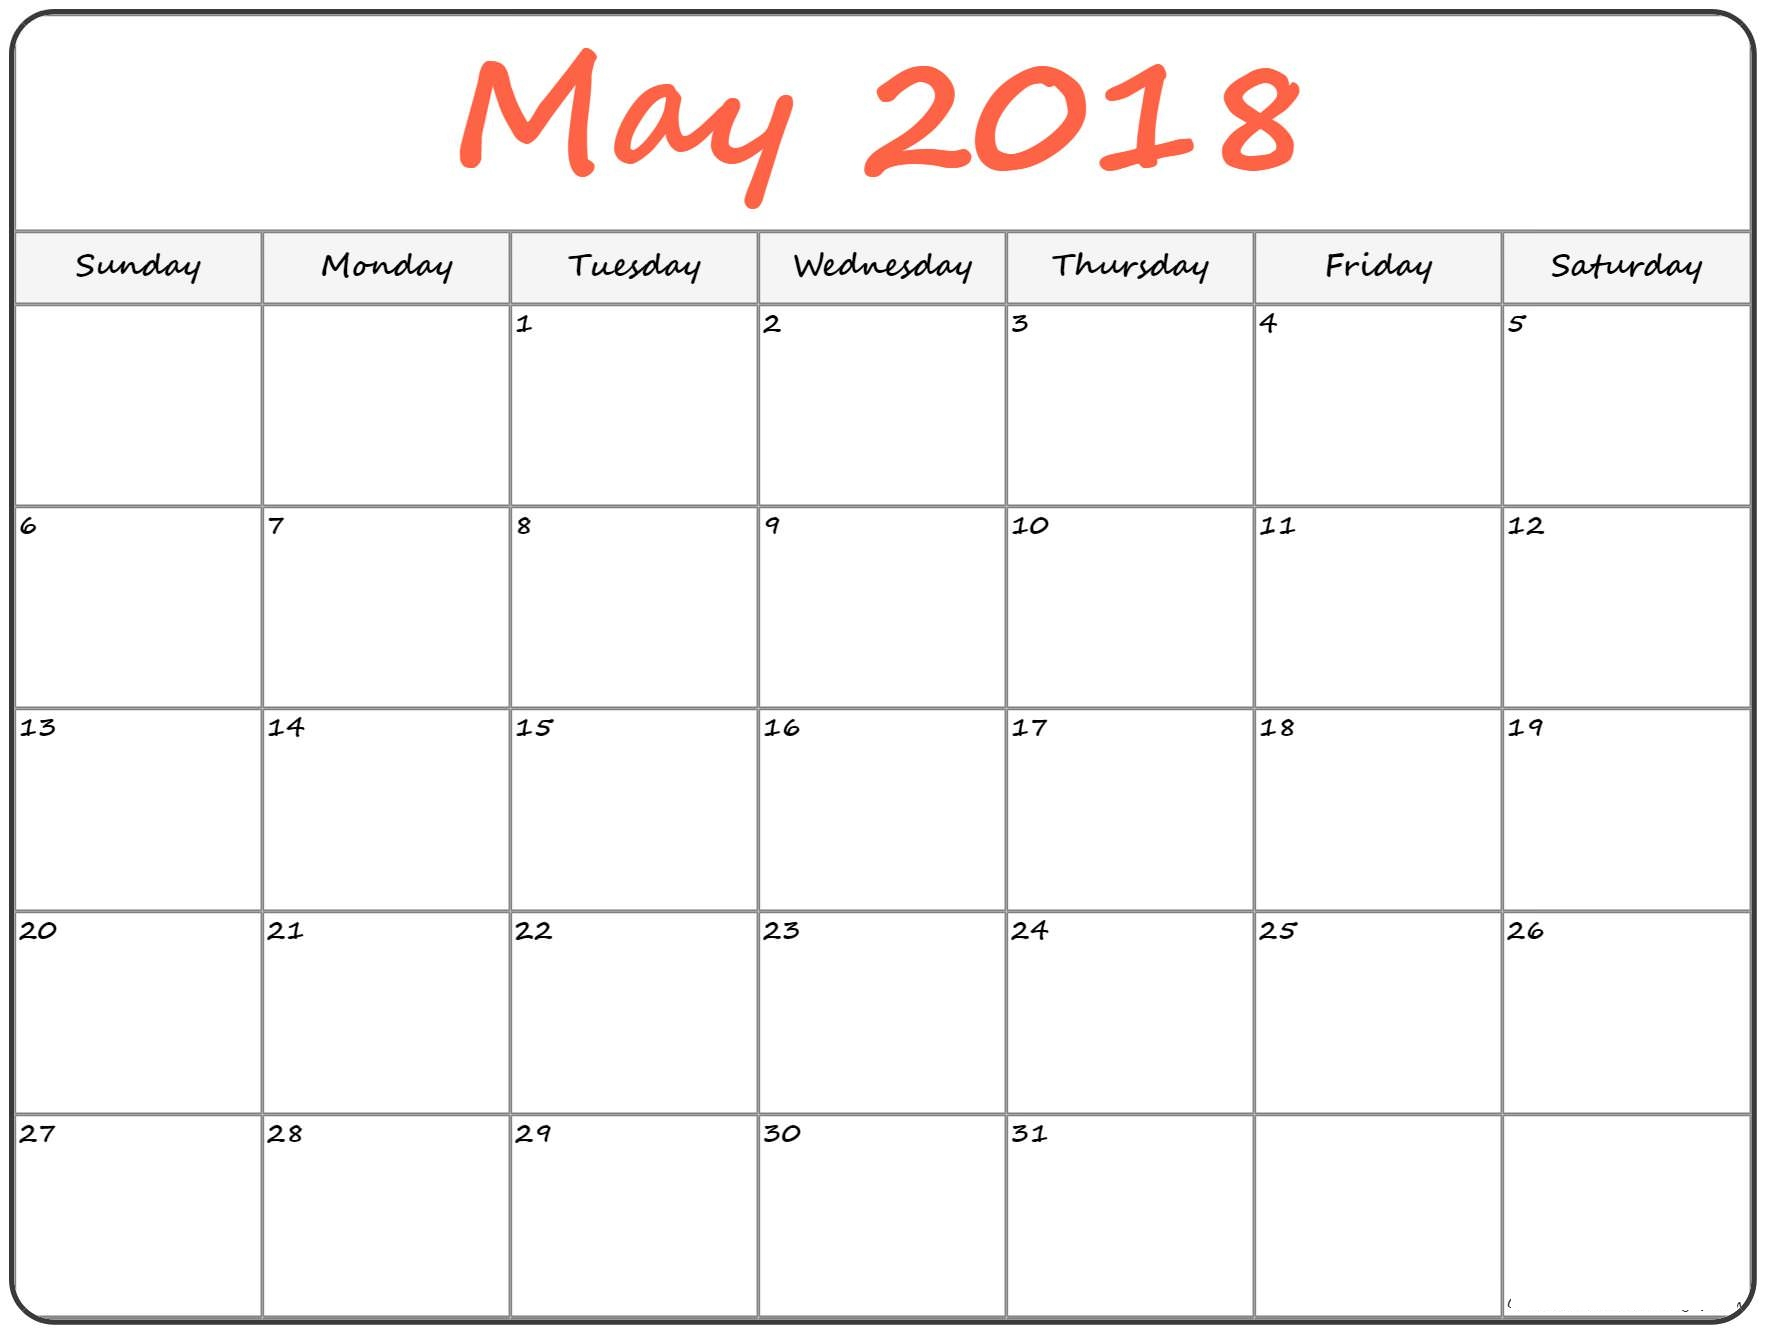 May 2018 Calendar Landscape Vertical Portrait Free